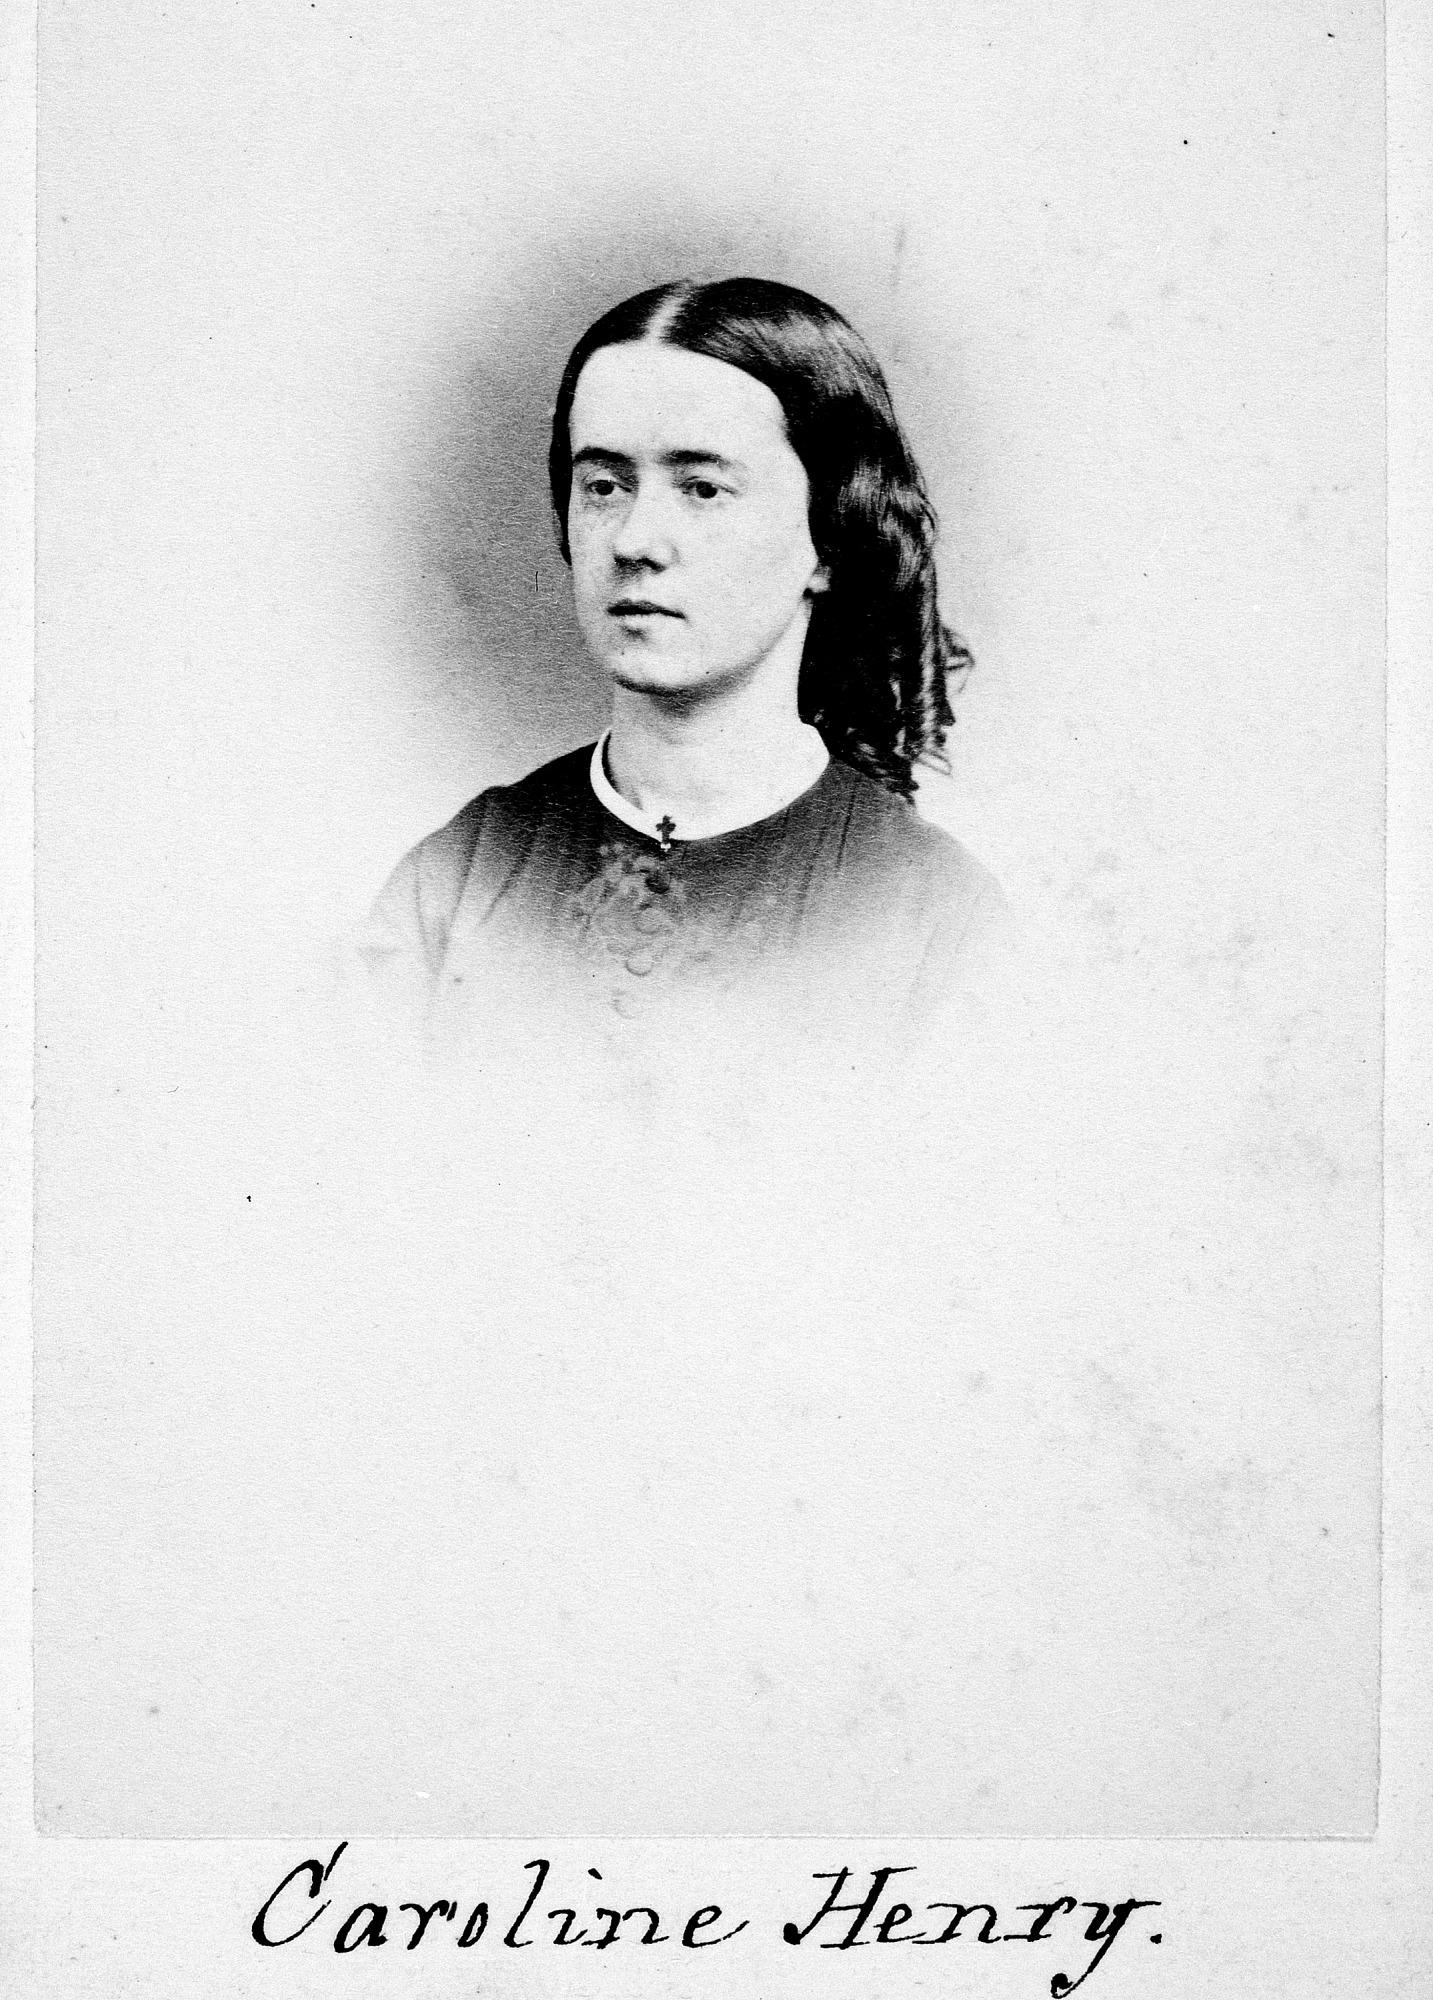 Joseph Henry's Daughter Caroline